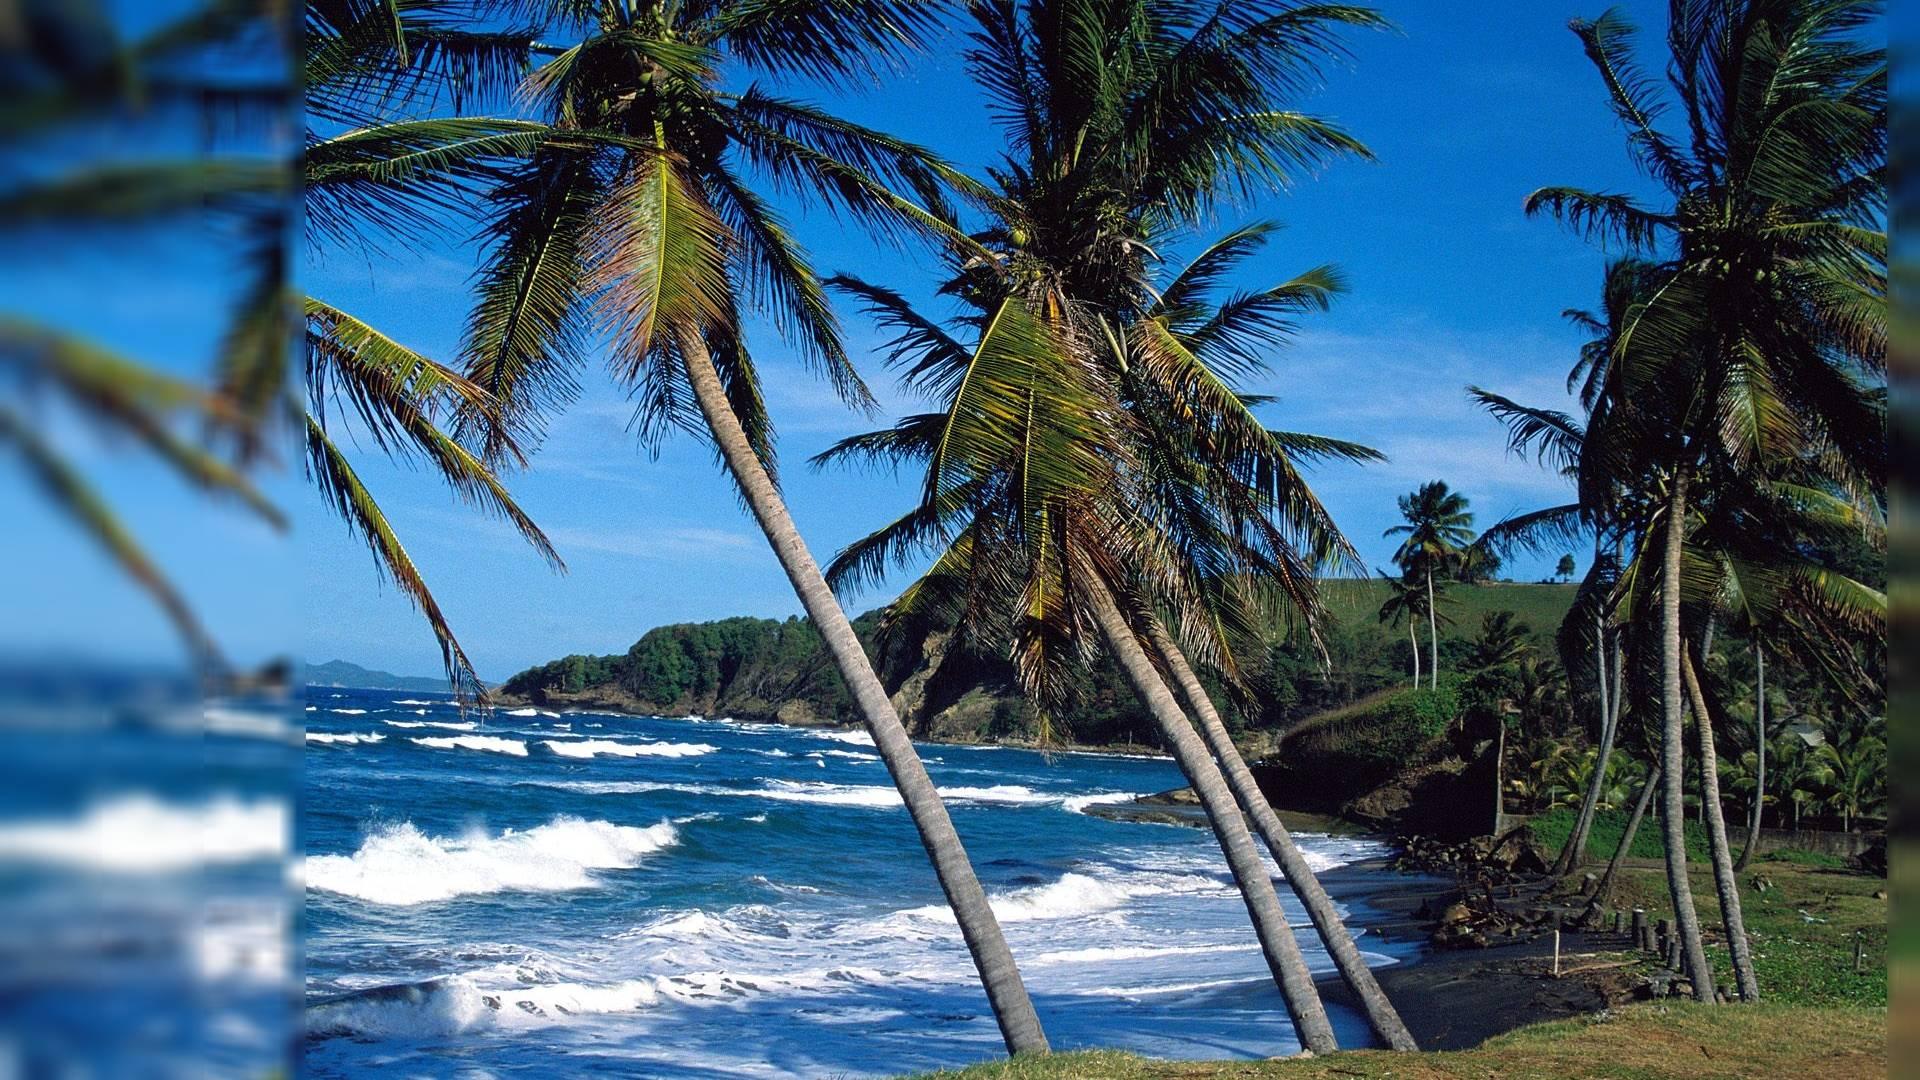 48 free maxine wallpapers for desktop on wallpapersafari - Free palm tree screensavers ...